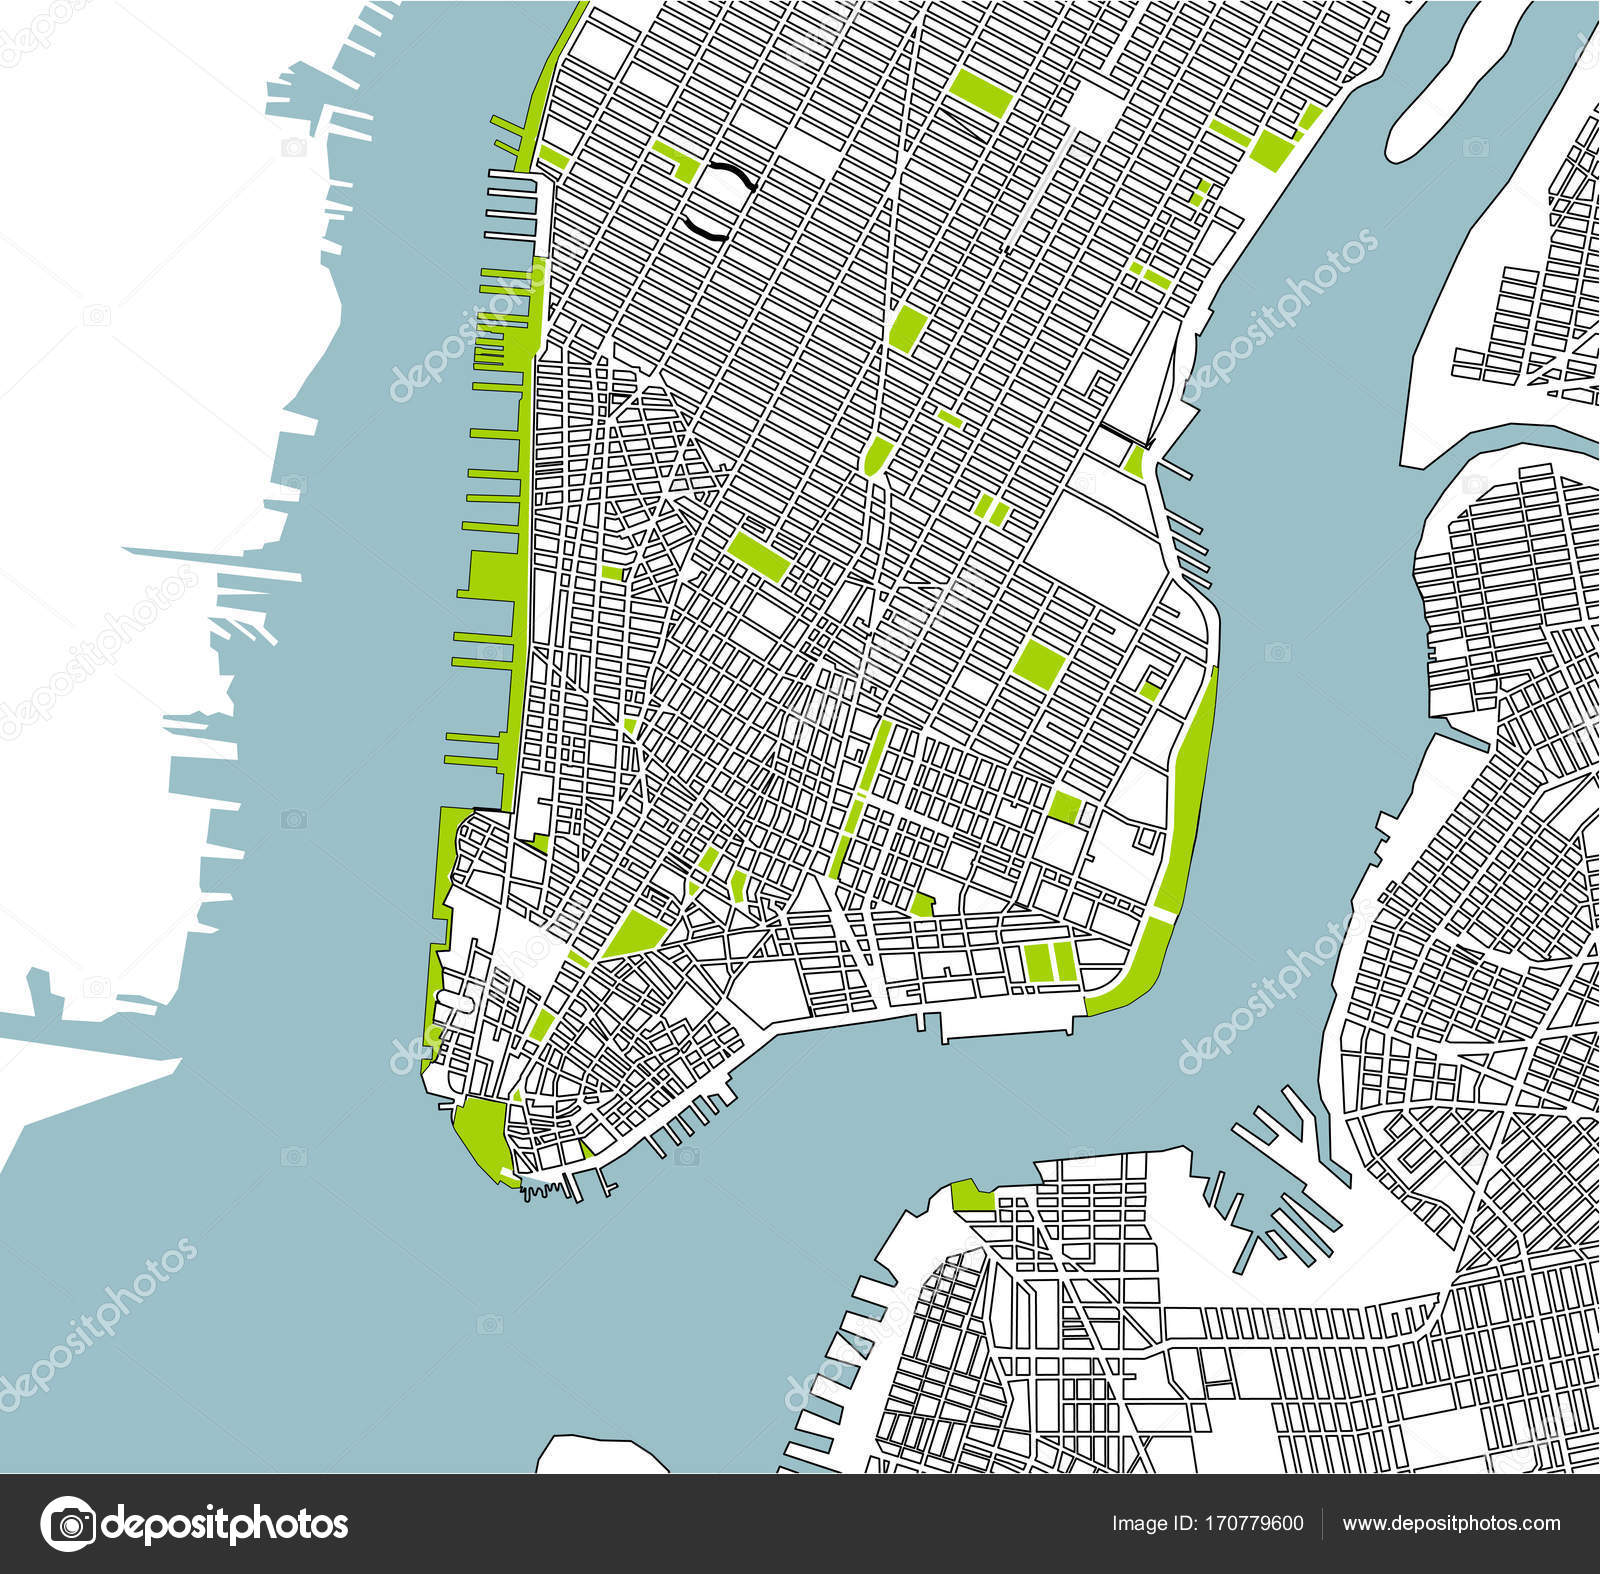 New York City On Map Of Usa.Map Of The New York City Ny Usa Stock Photo C Tish11 170779600